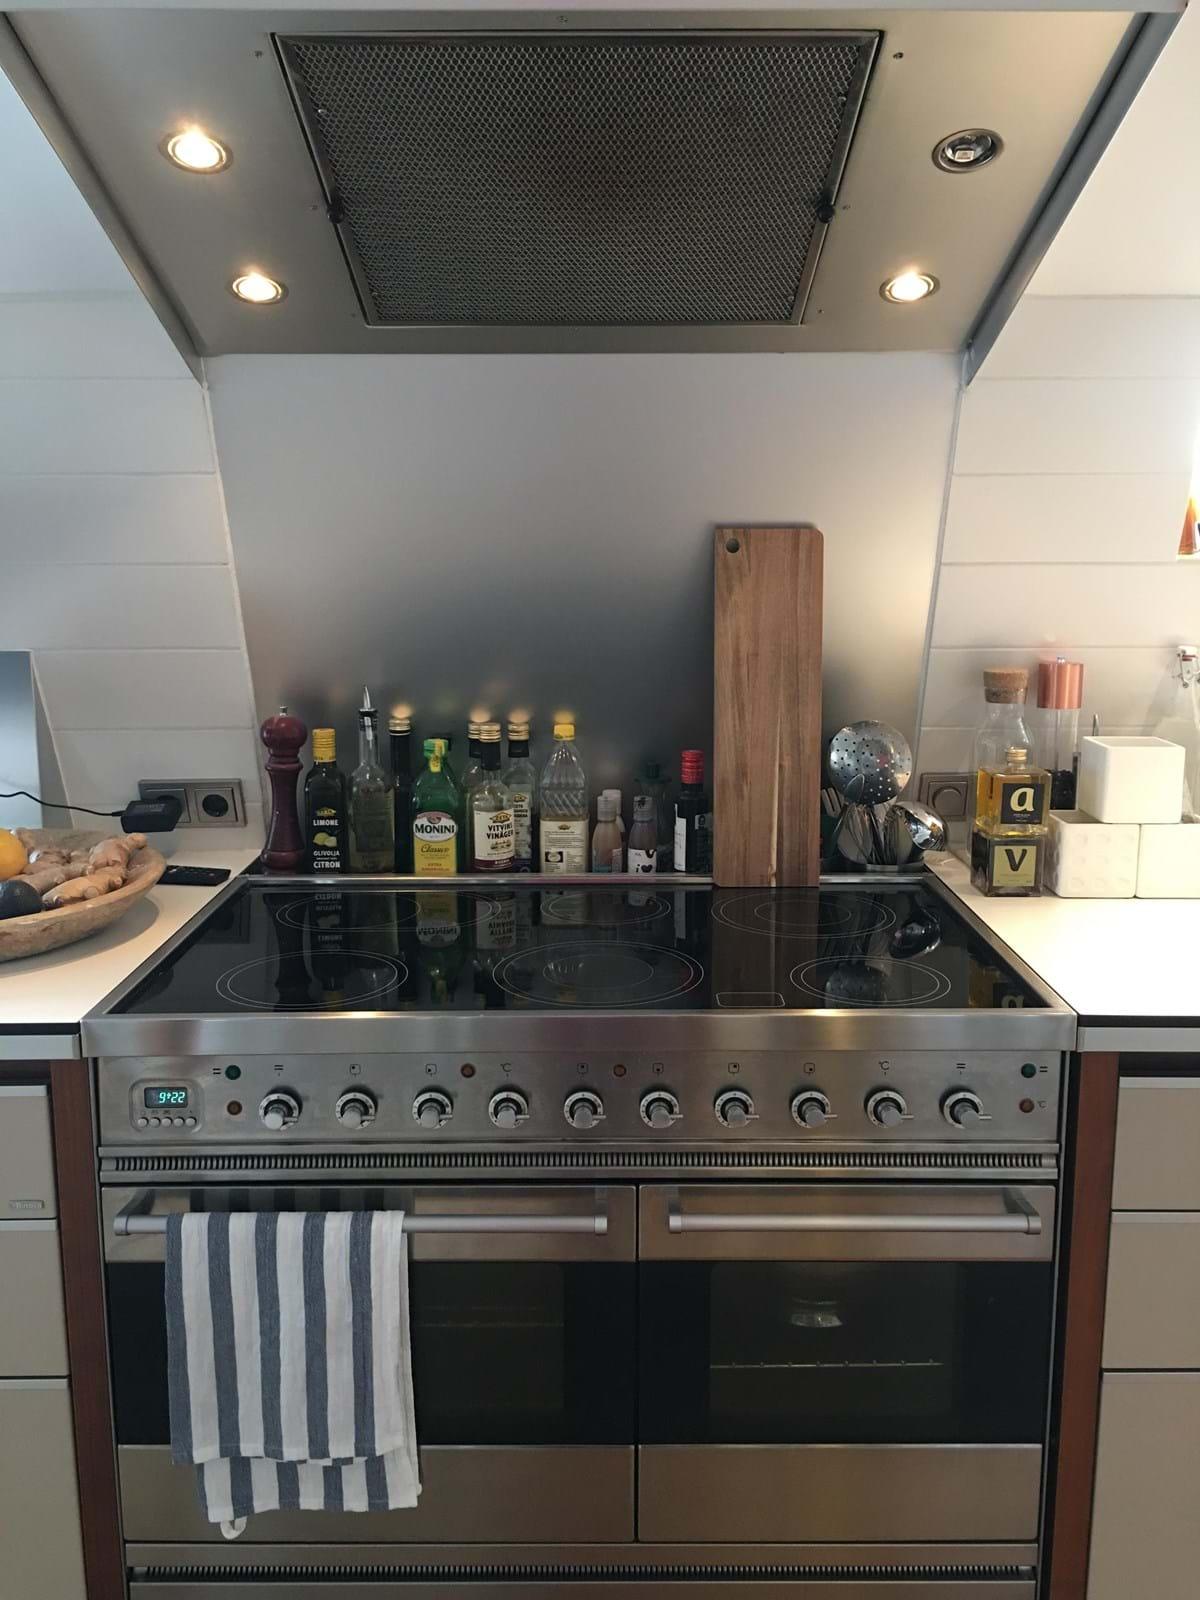 Kungsbacka kitchen - Apartment Rents Kungsbacka